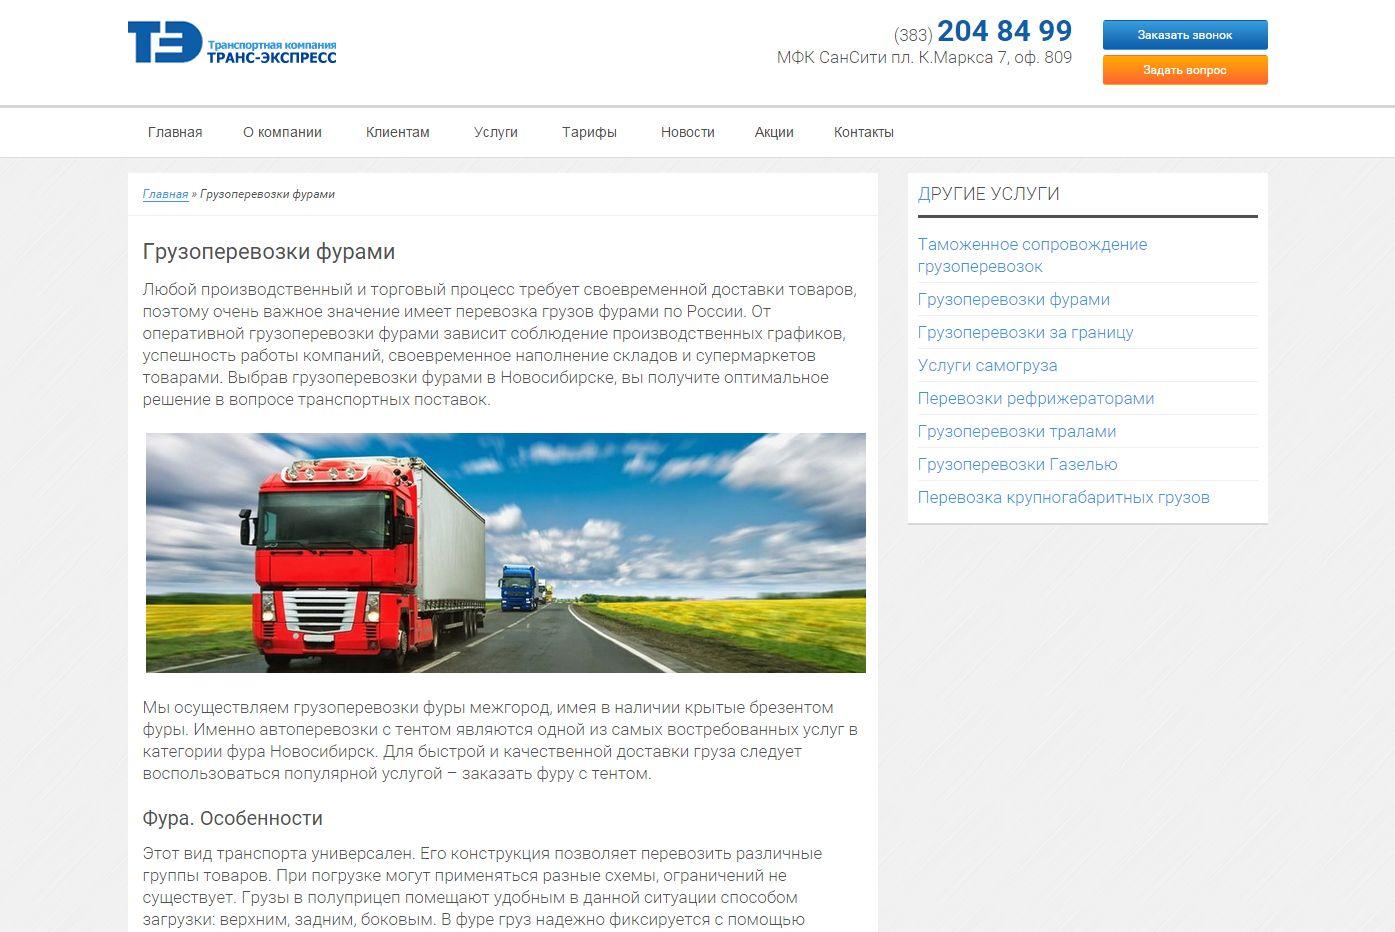 zao-trans-ekspress-servis